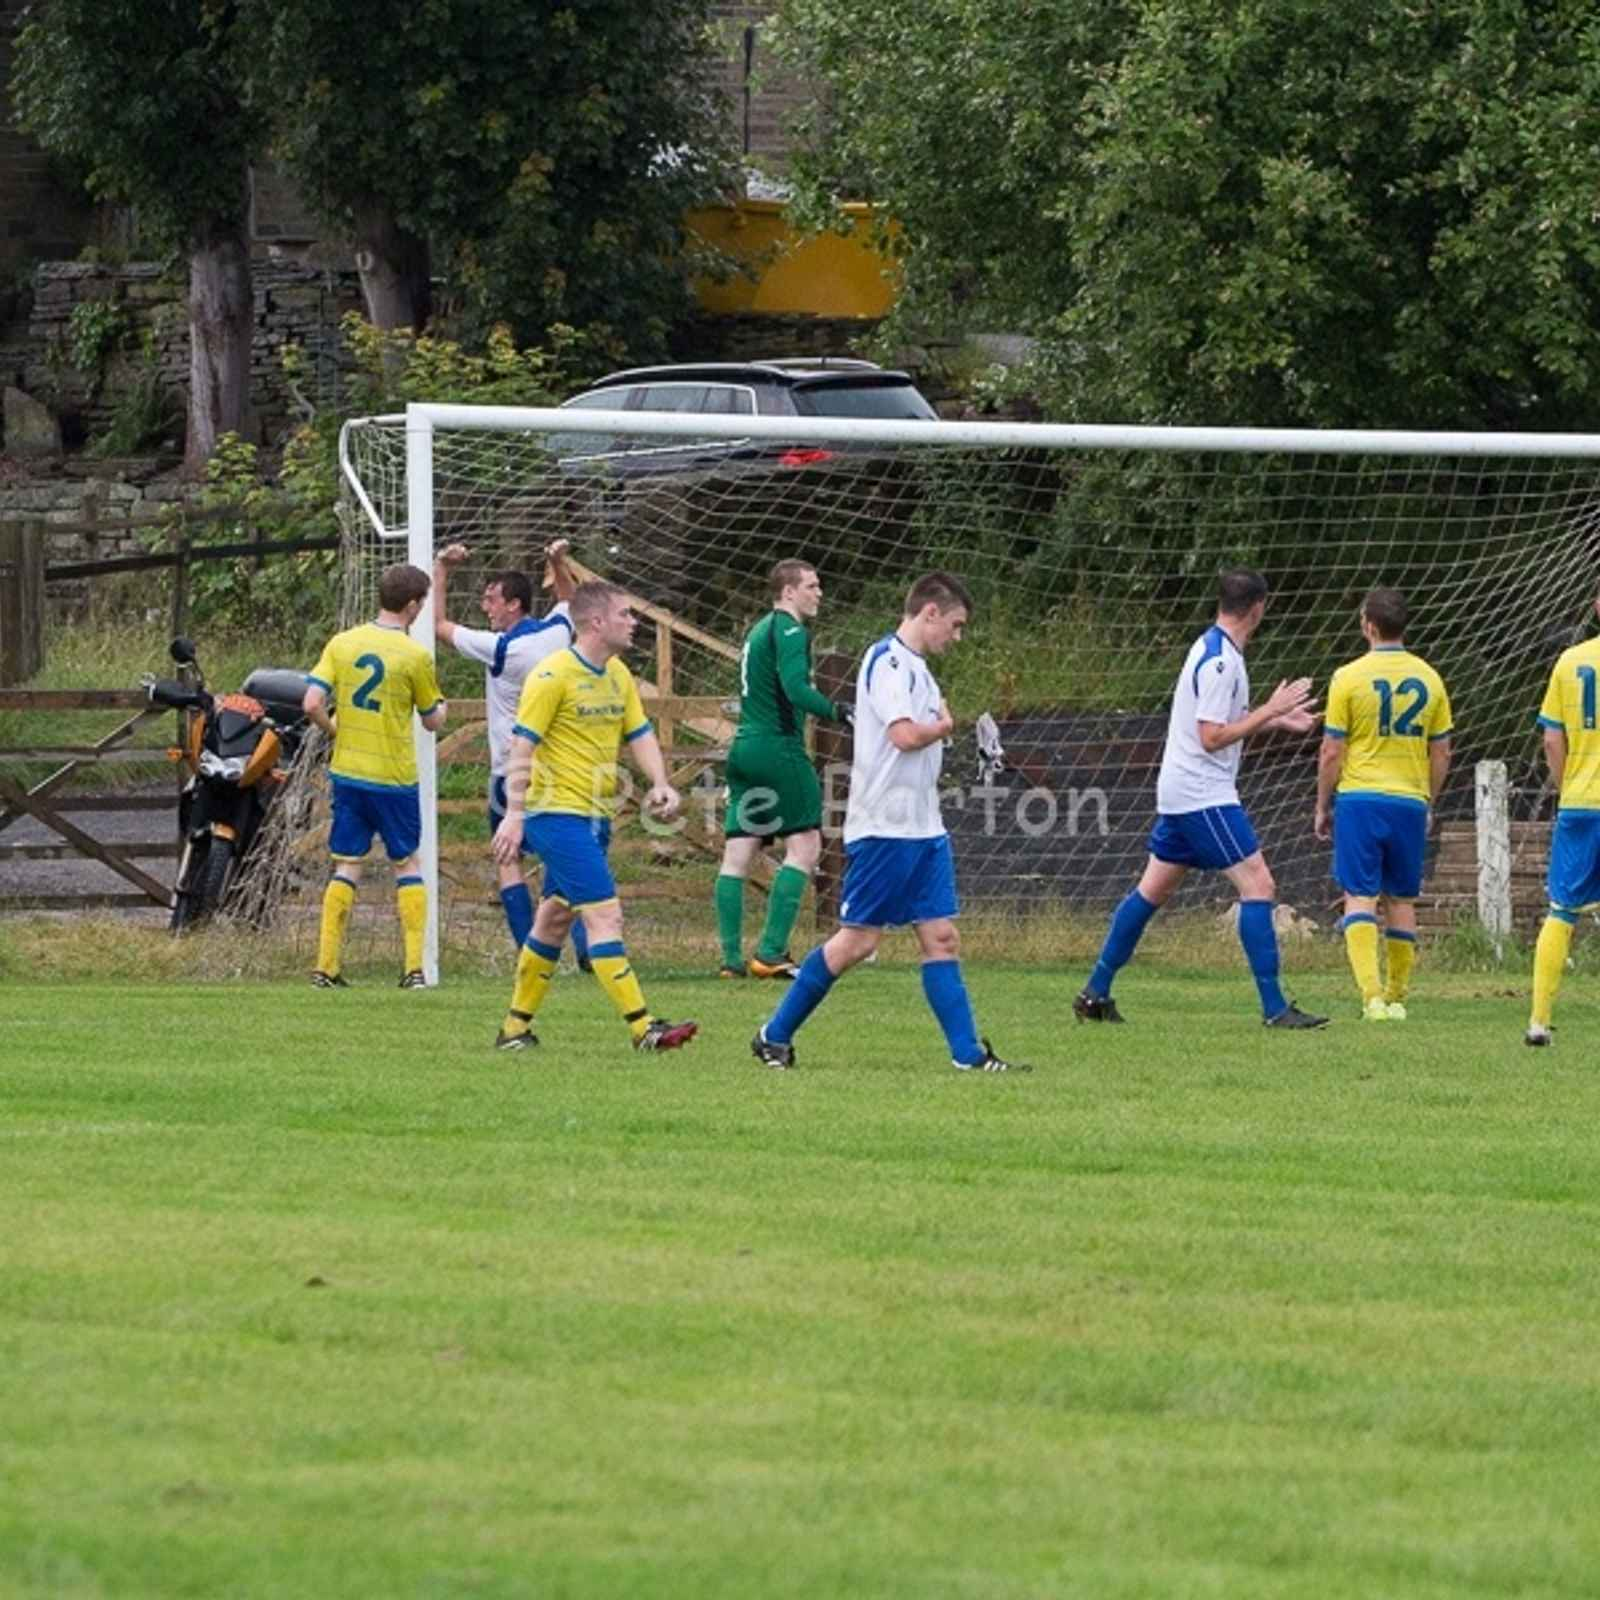 Preseason - Turton FC 1 Ashton Athletic 4 - 21/7/16